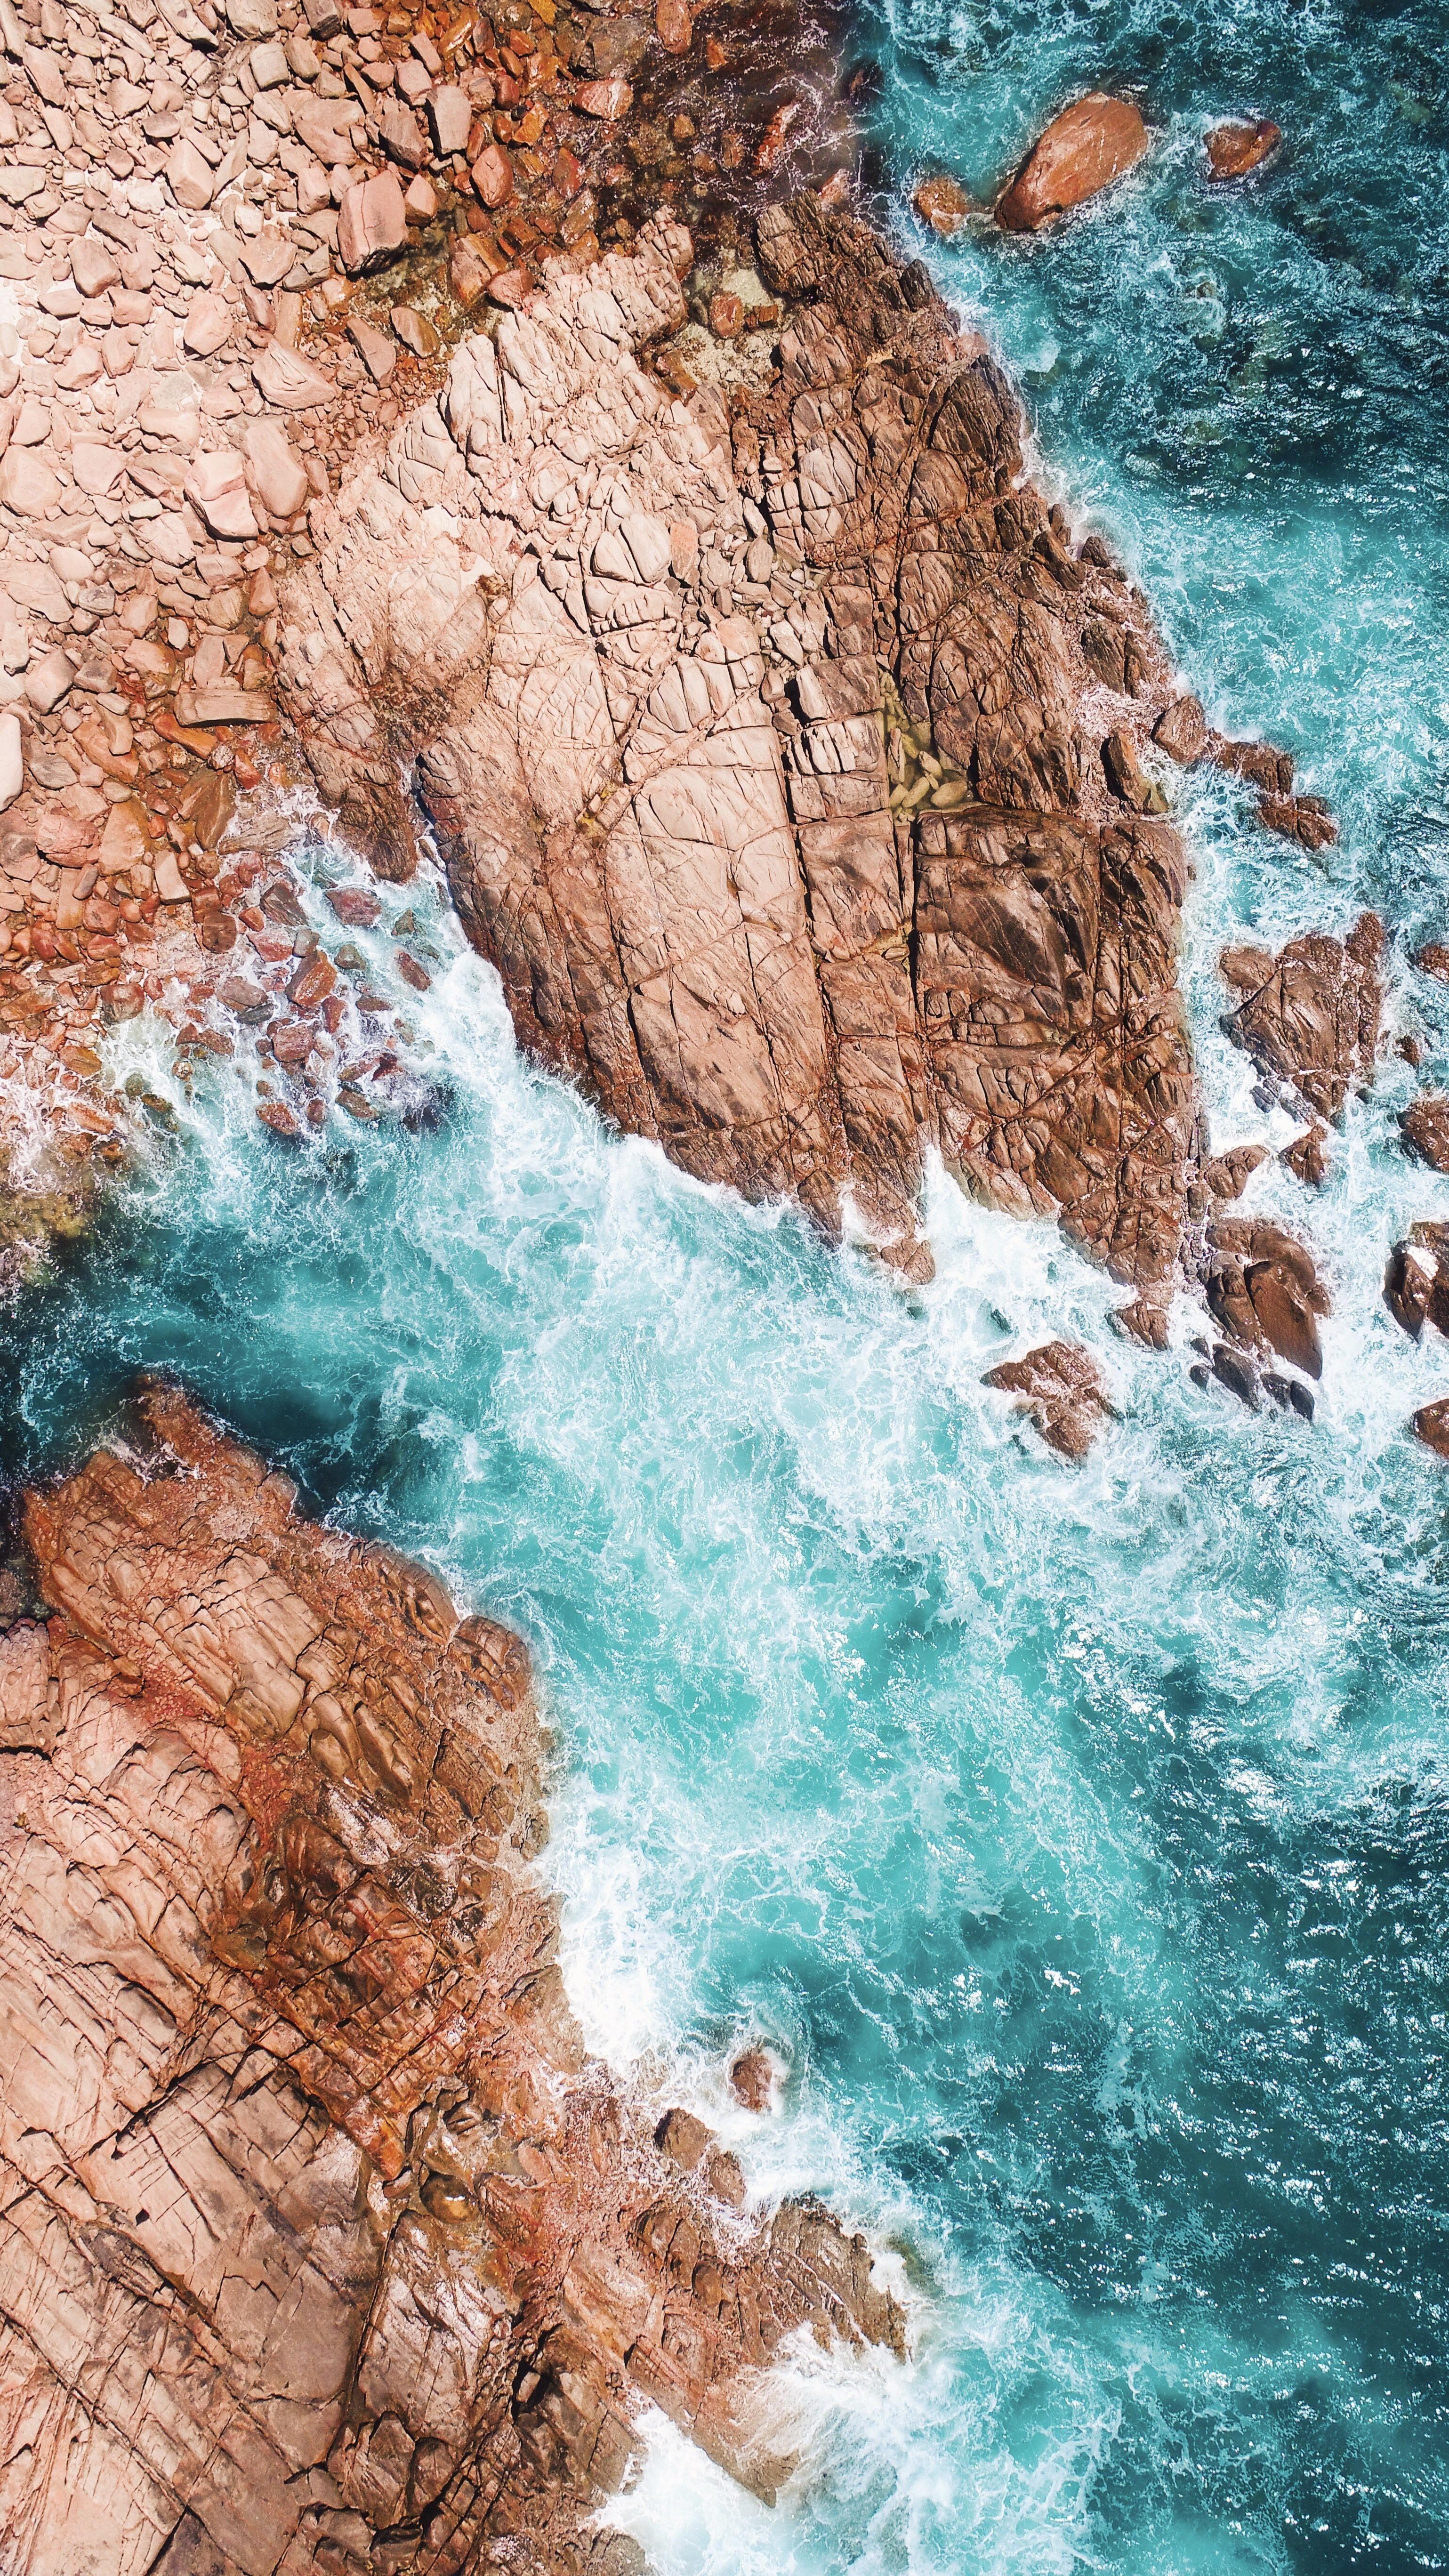 Island Rock Kalbarri Western Australia 5472 X 3078 Nature Photography Travel Australiatr Landscape Pictures Aerial Photography Drone Nature Photography